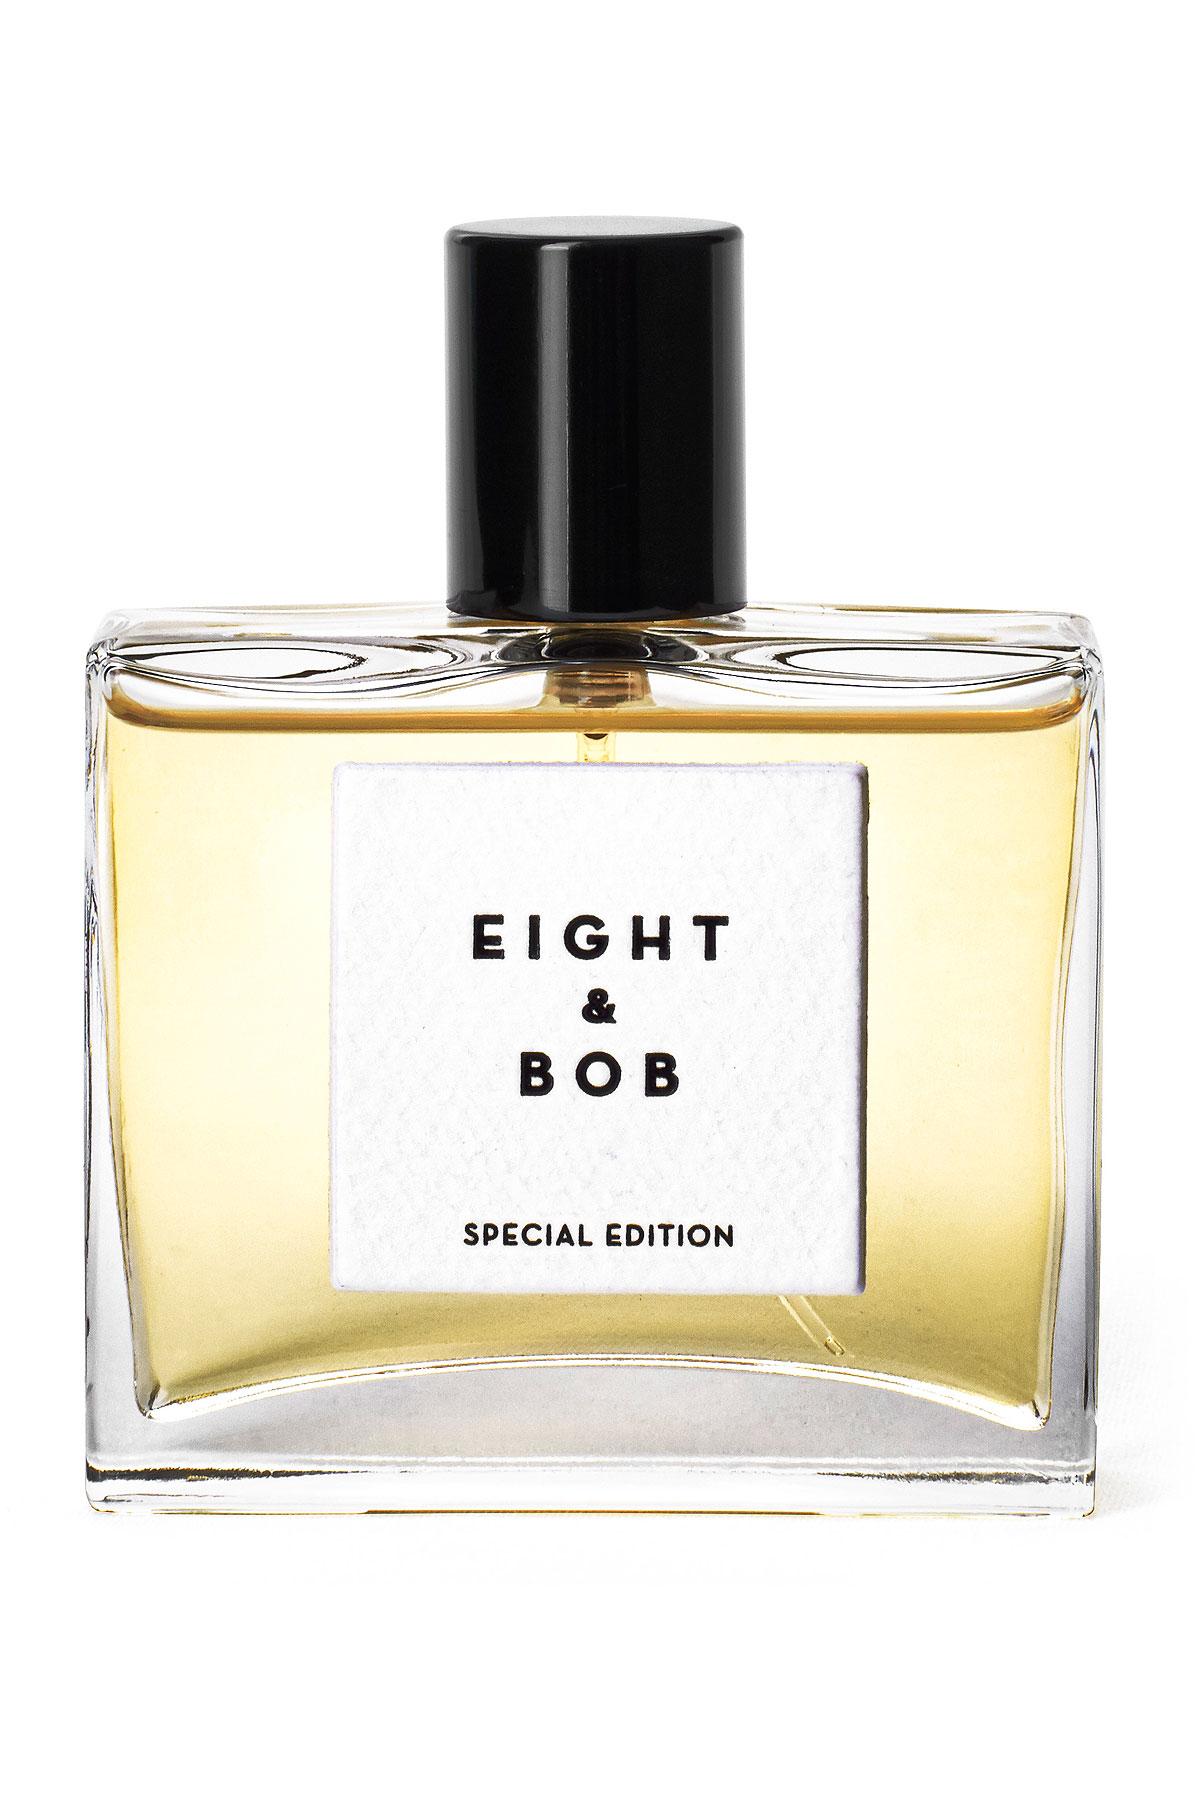 Eight & Bob Fragrances for Men, Robert F Kennedy Special Edition - Eau De Parfum - 50 Ml, 2019, 50 ml